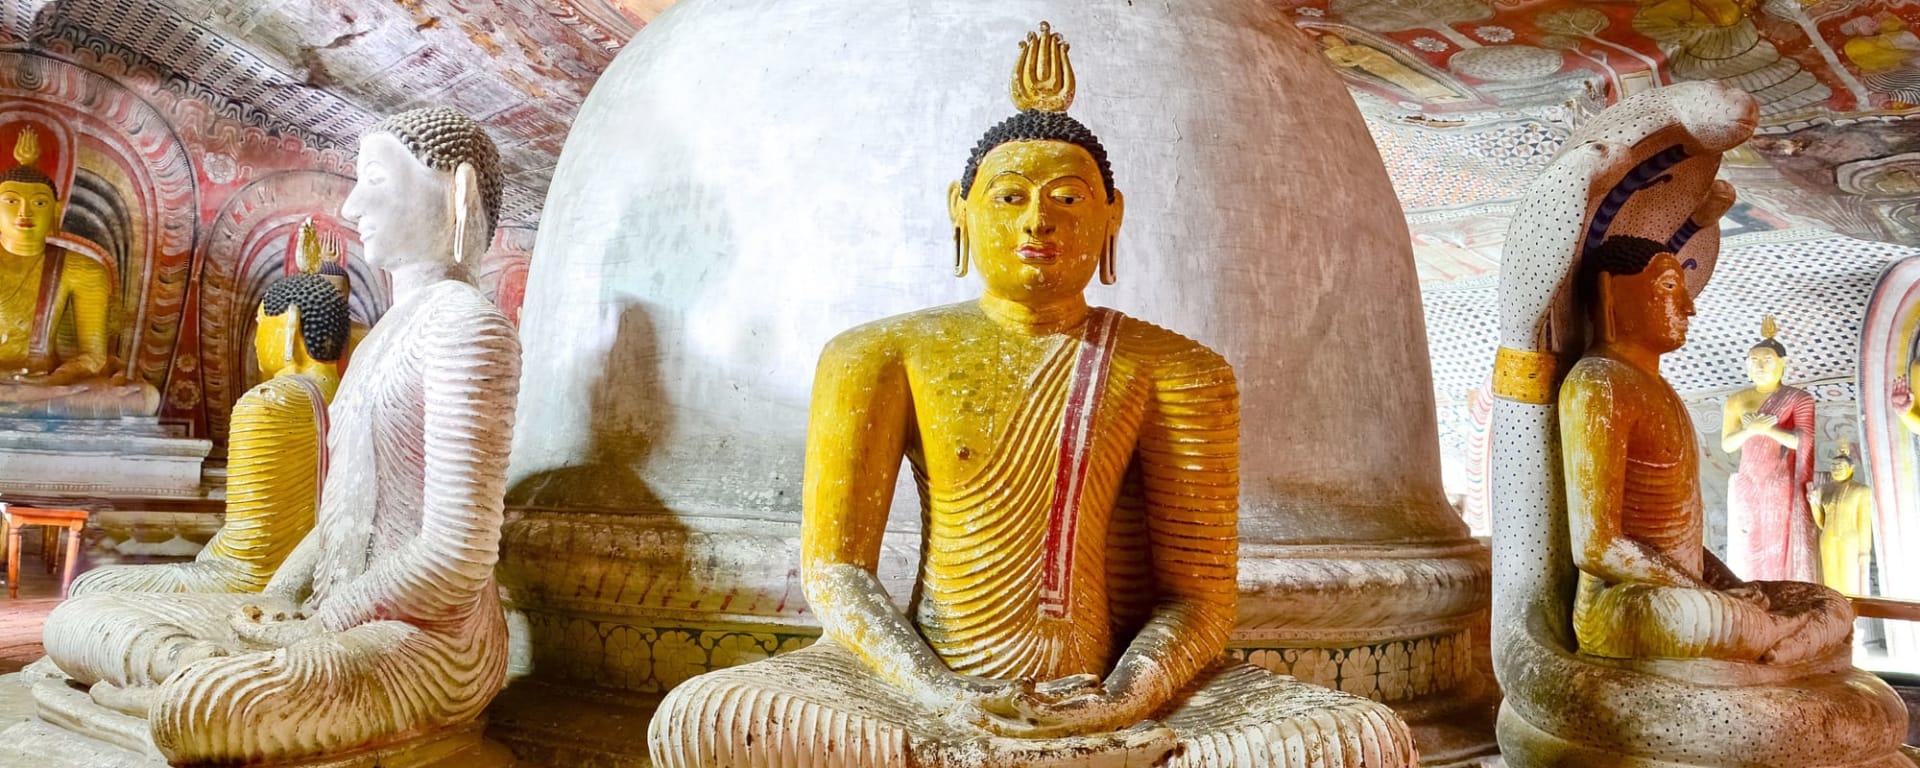 Sigiriya Jungles und Umgebung: Sri Lanka Dambulla